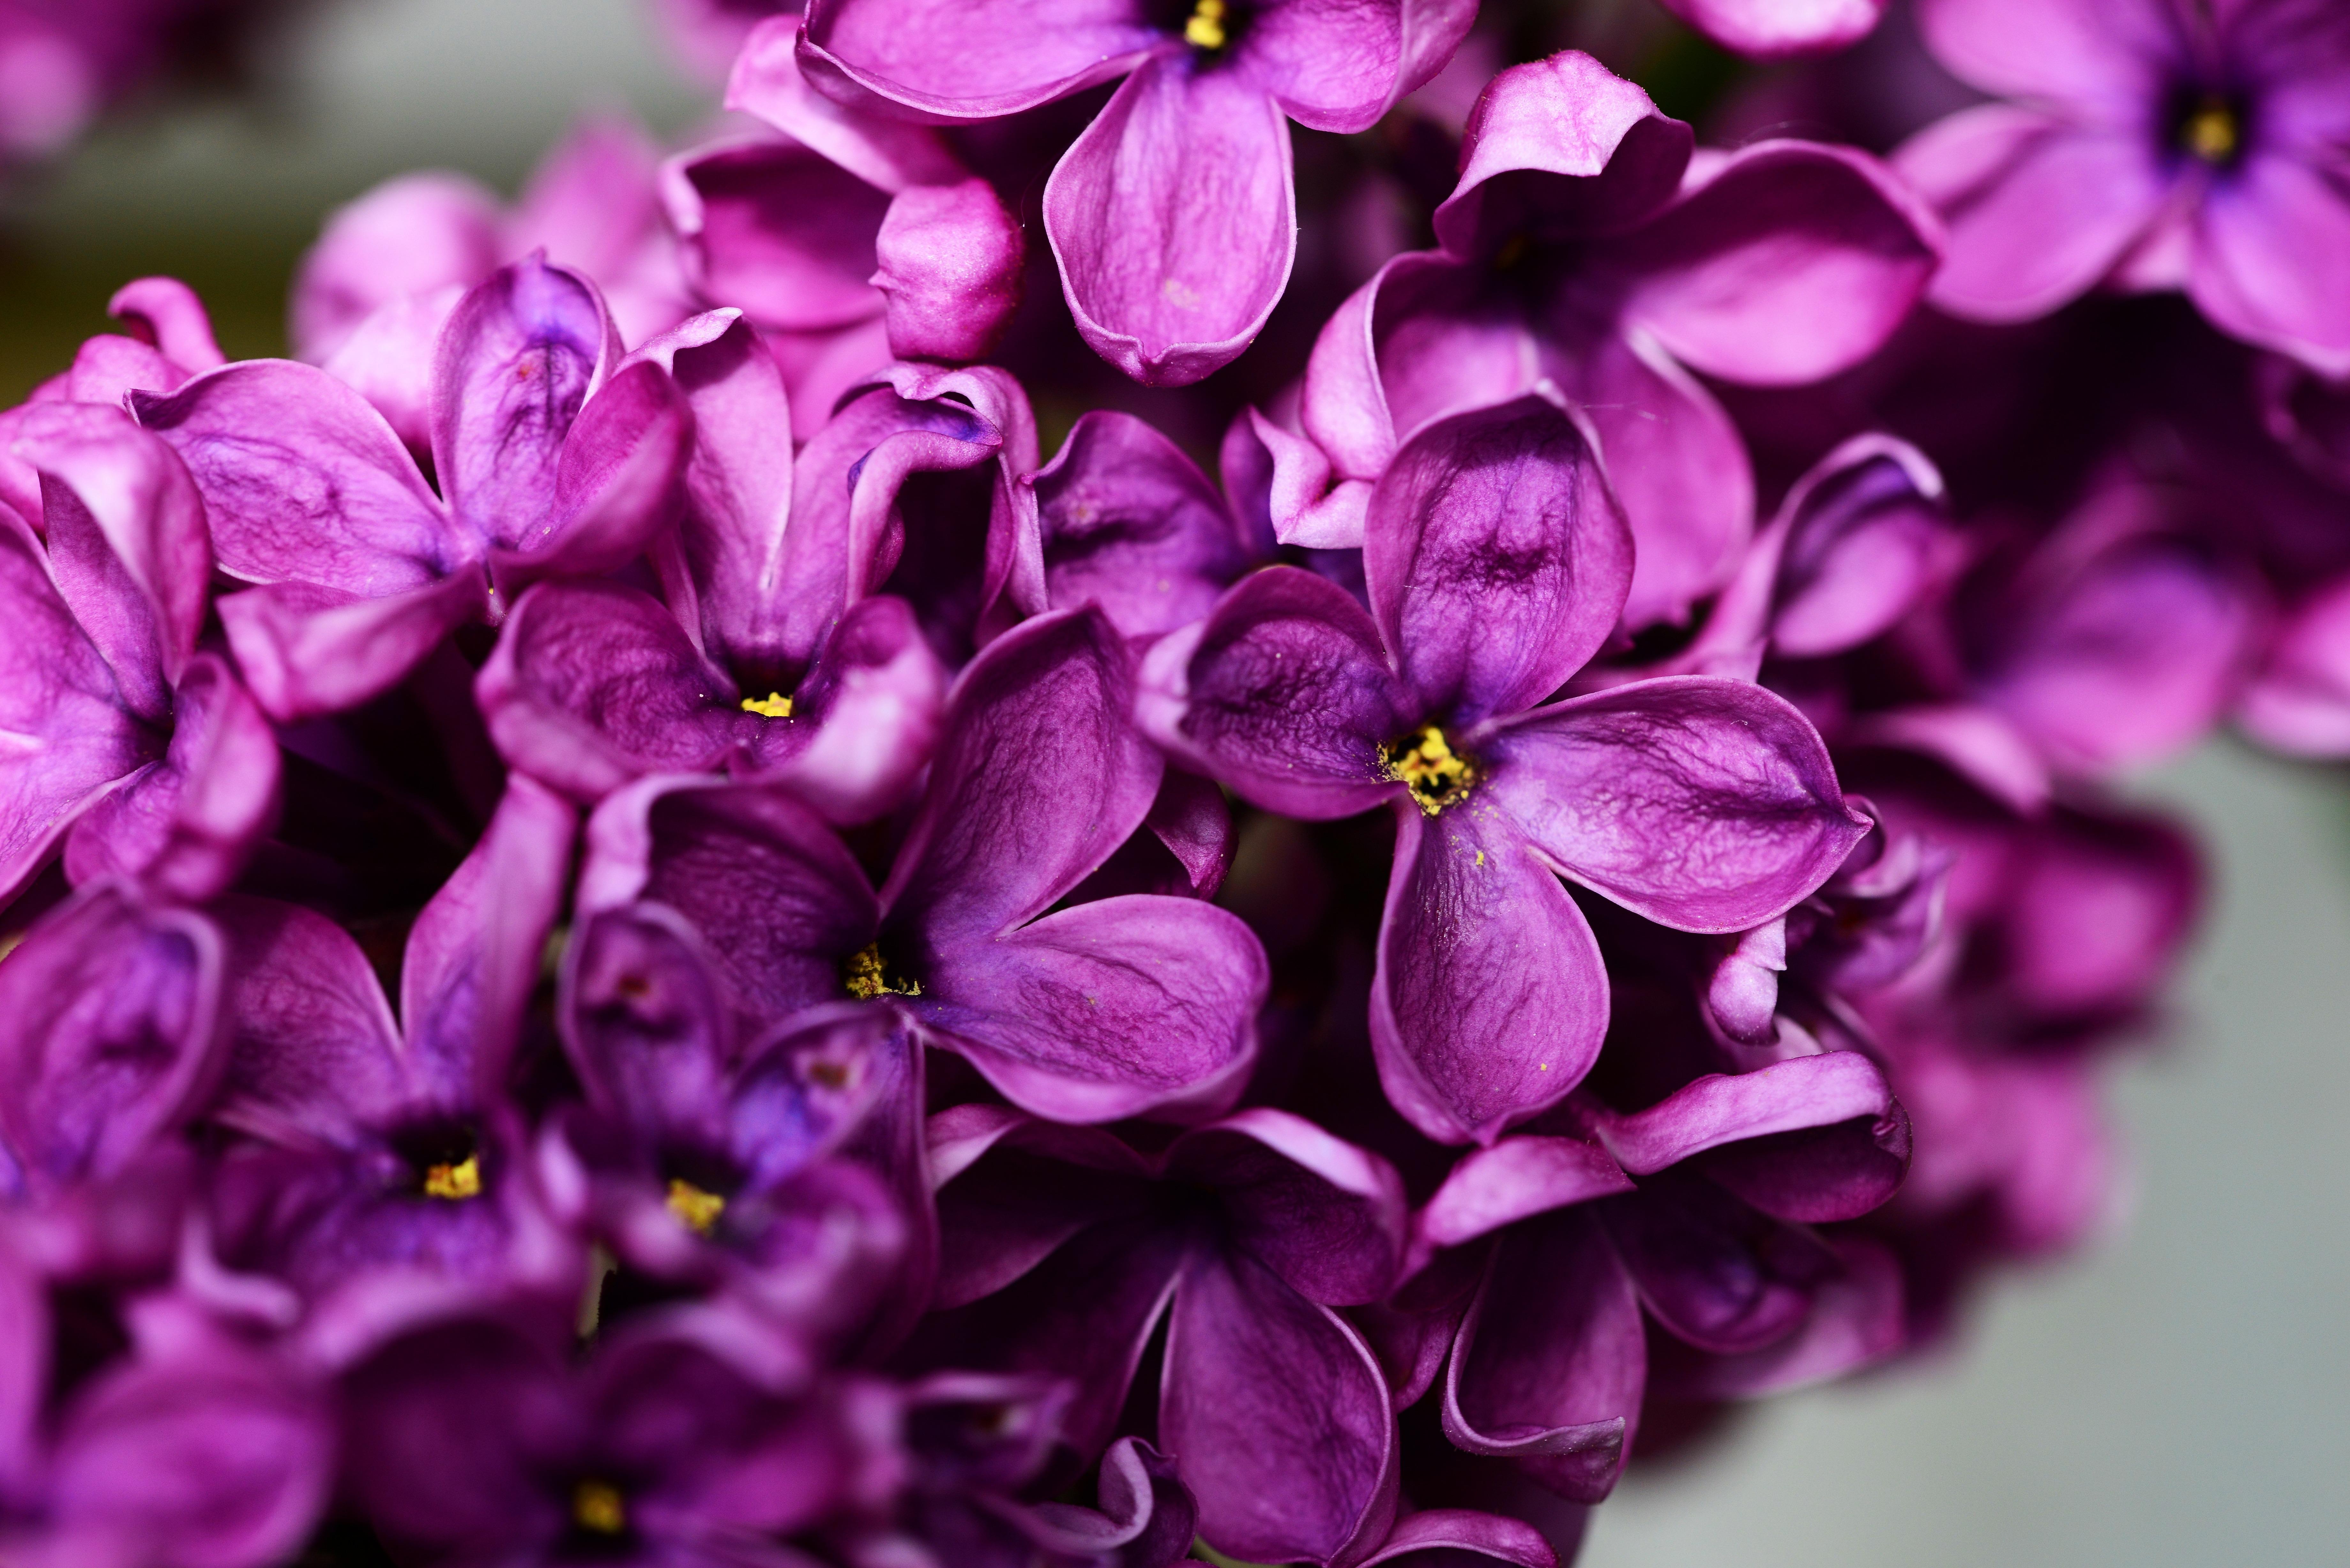 Картинки в фиолетовом цвете фото